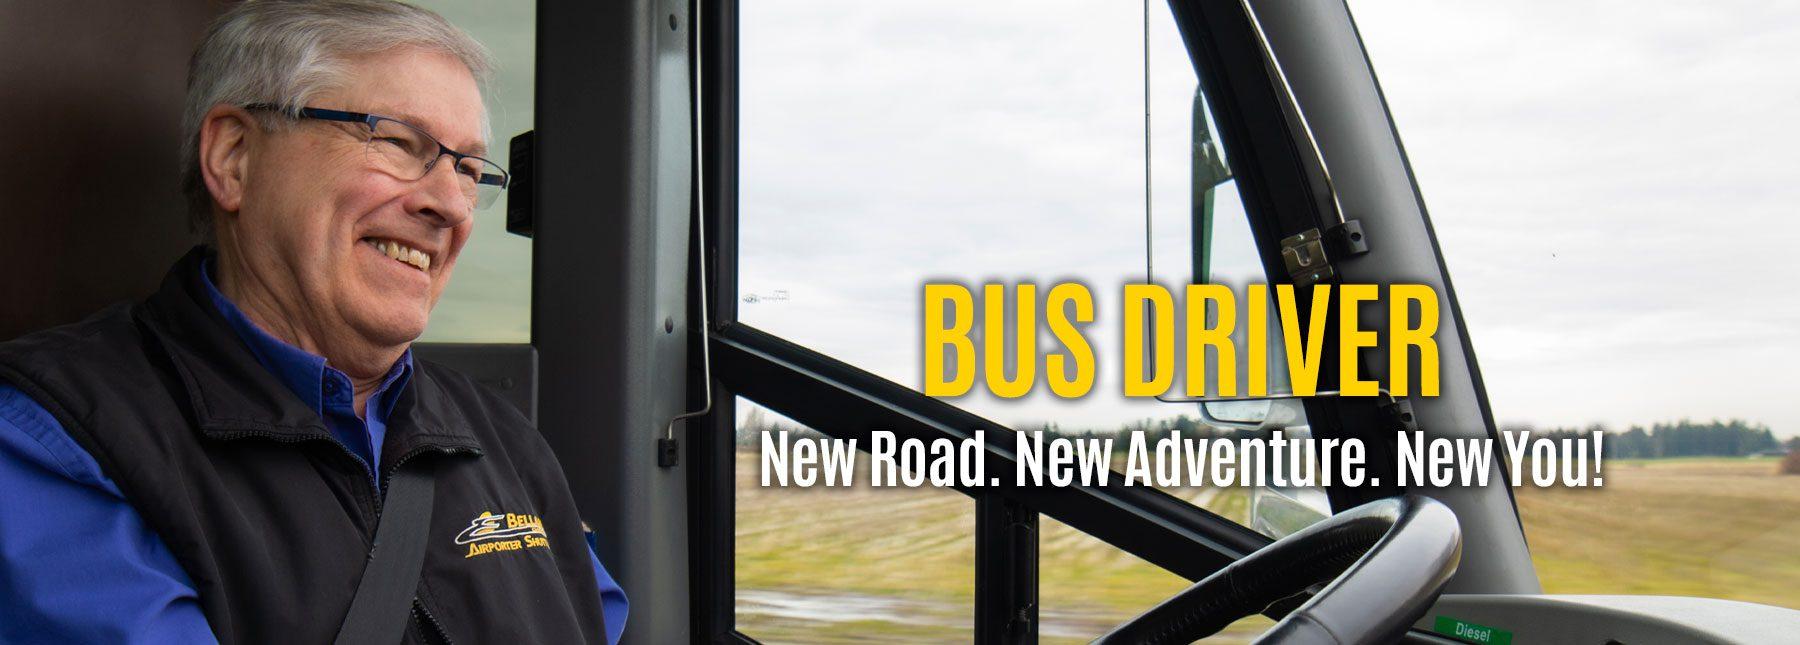 Bus Driver V5 20210920 1800x645